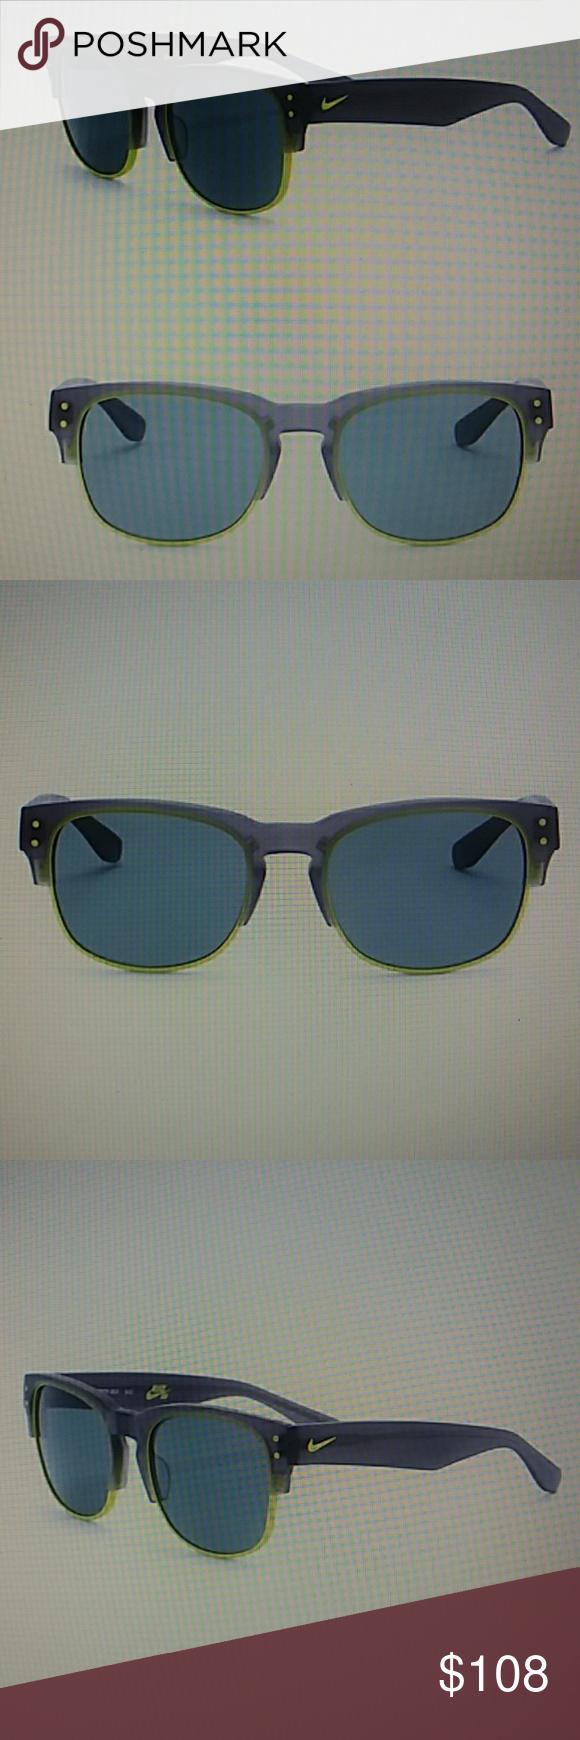 2949a2fe317b Nike Volition 54mm Clubmaster Sunglasses Stile:Clubmaster Size :  54-20-140mm (eye-bridge-temple) Frame color :black/green Frame Material  :Acetate/metal ...